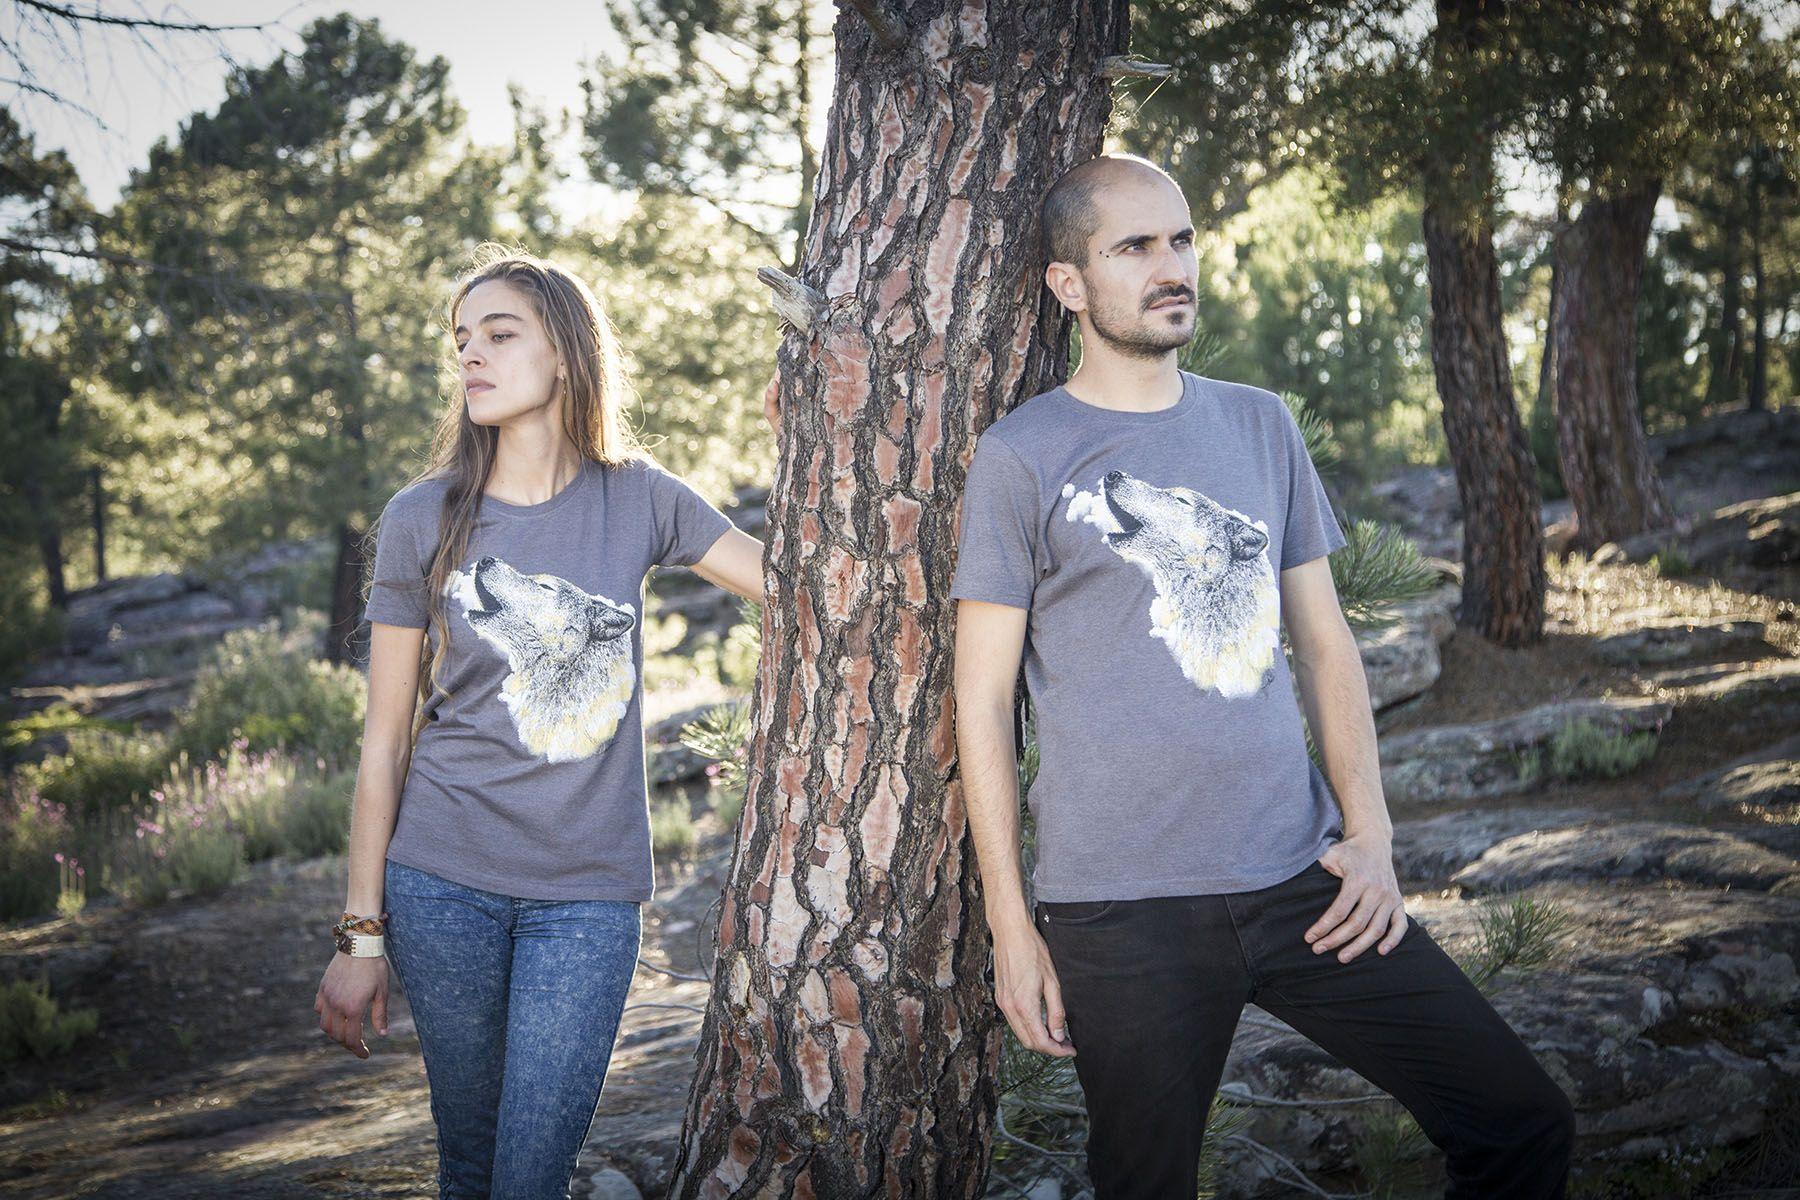 sirem wild-coleccion animales totem-moda sostenible-lobo